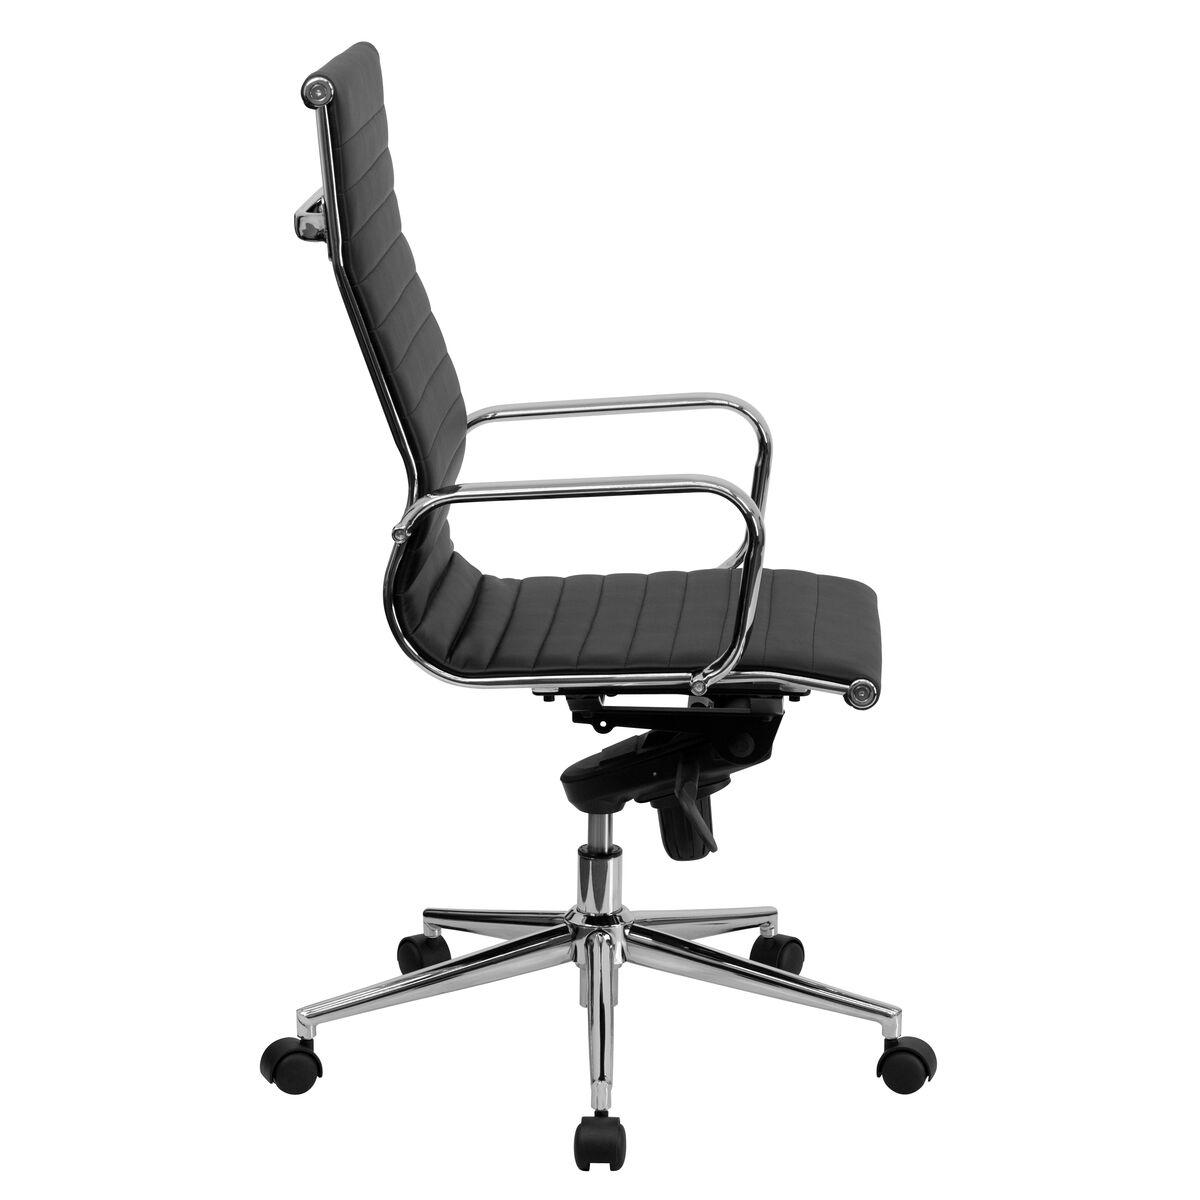 office leather chair. Office Leather Chair G